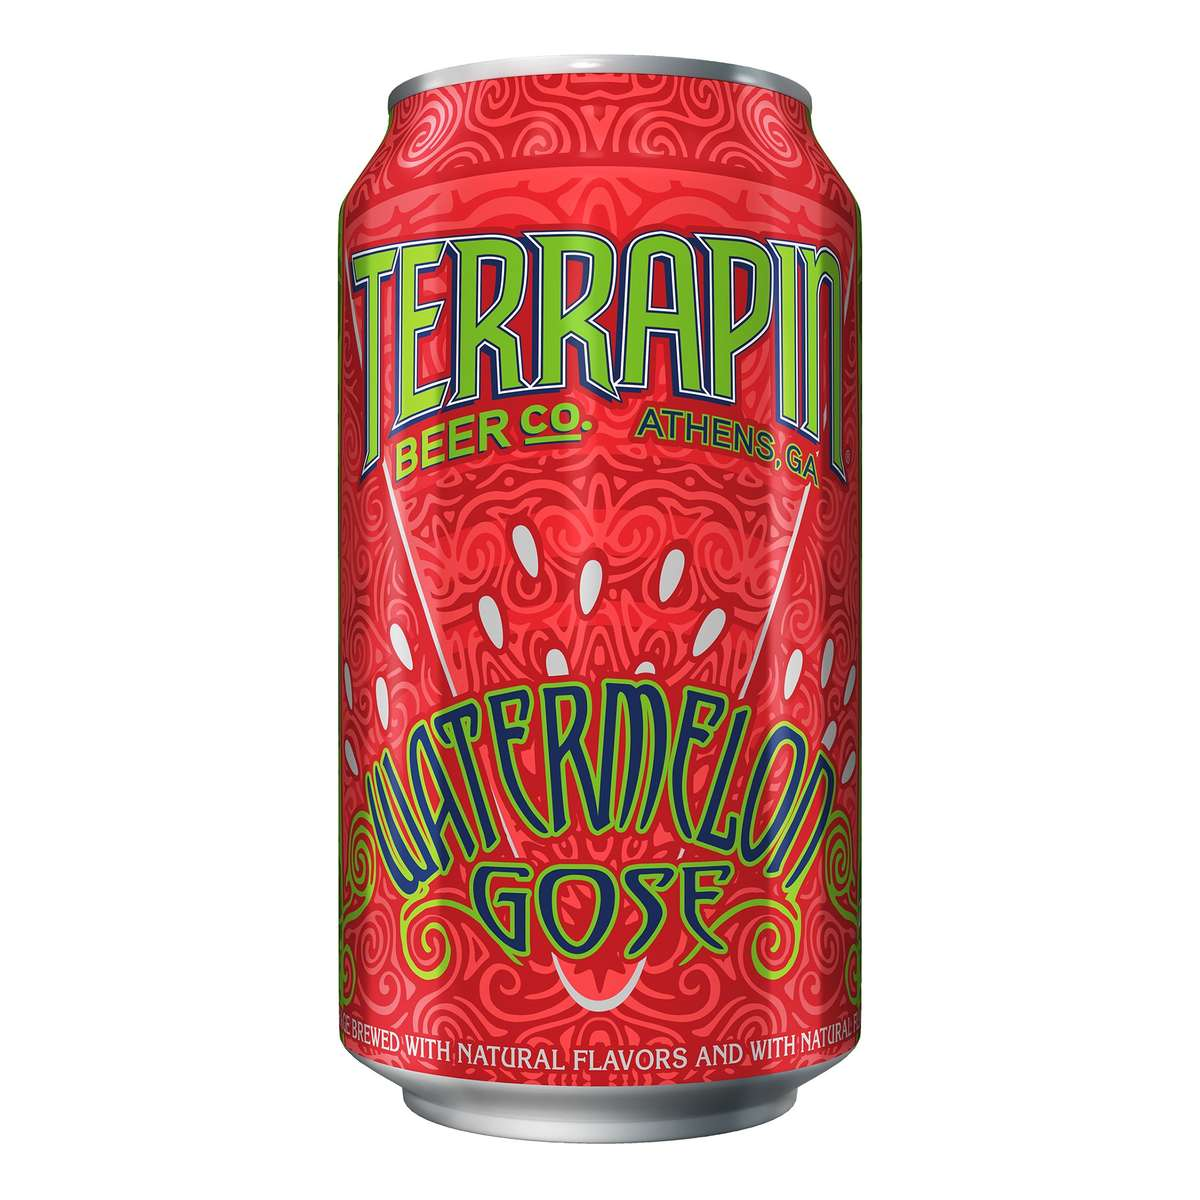 Watermelon Gose - Terrapin Beer Co, GA